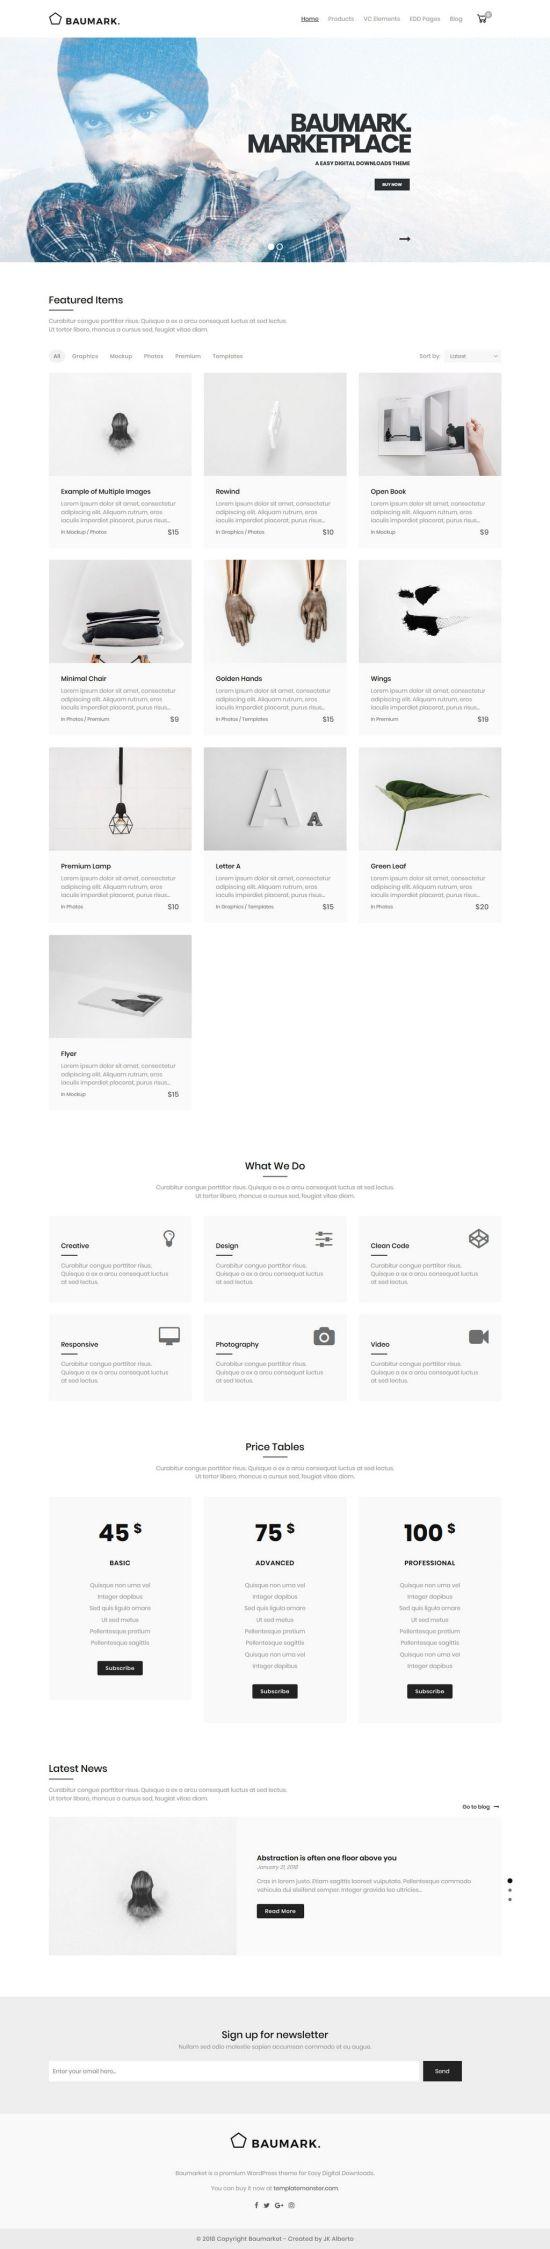 baumarket wordpress theme 01 - Baumarket WordPress Theme